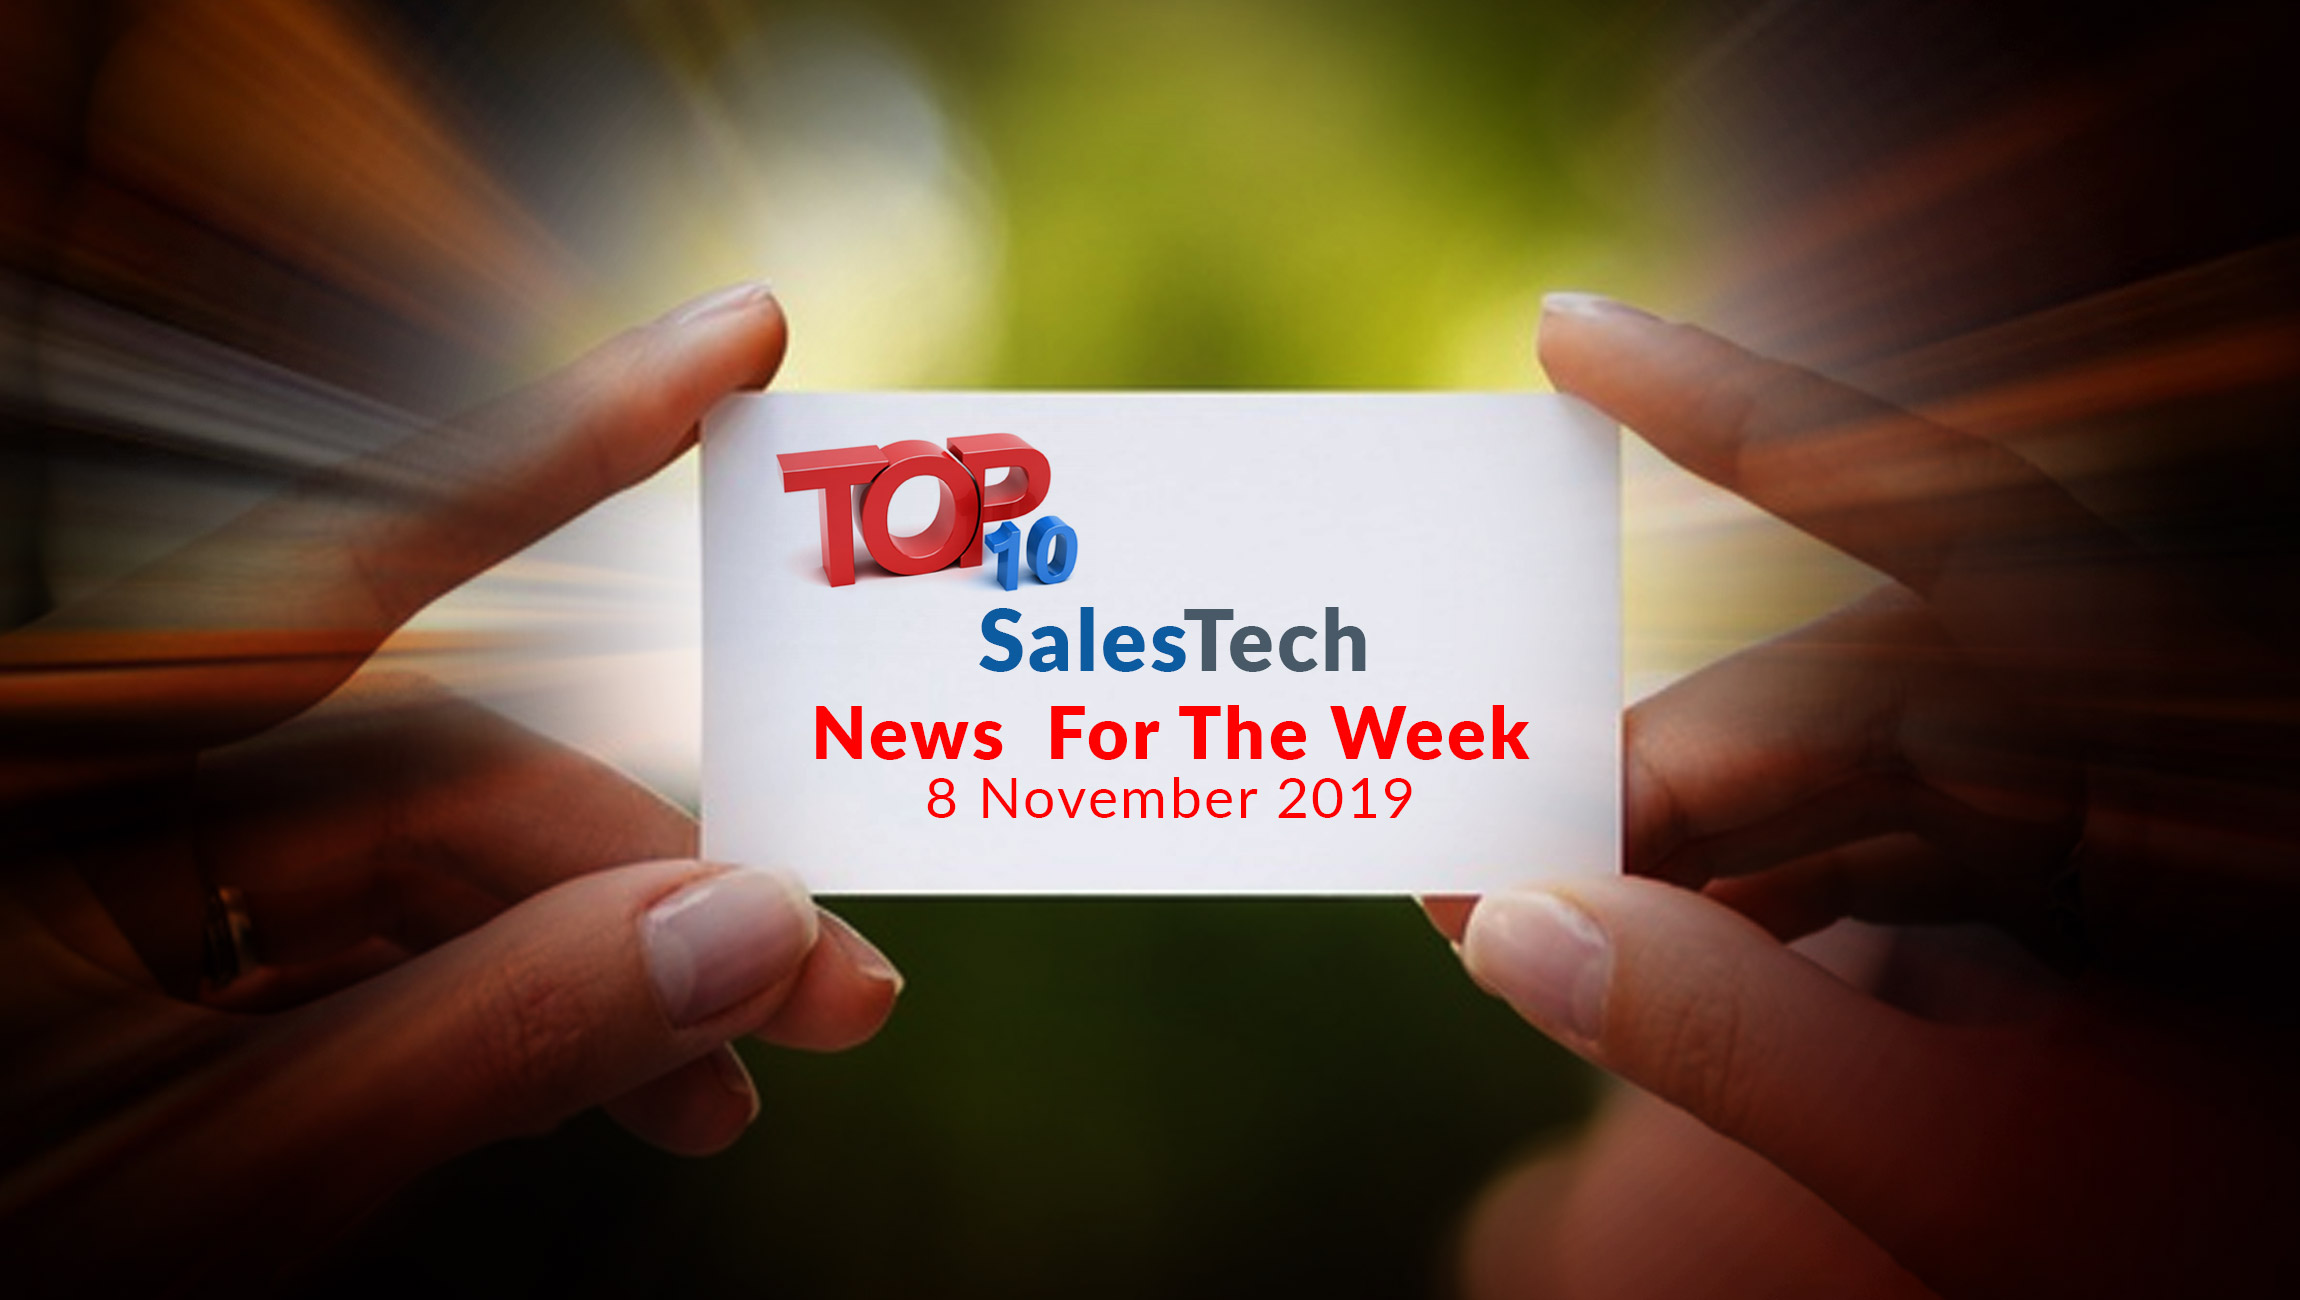 SaleTech Star's Top 10 News For The Week - 9 November 2019